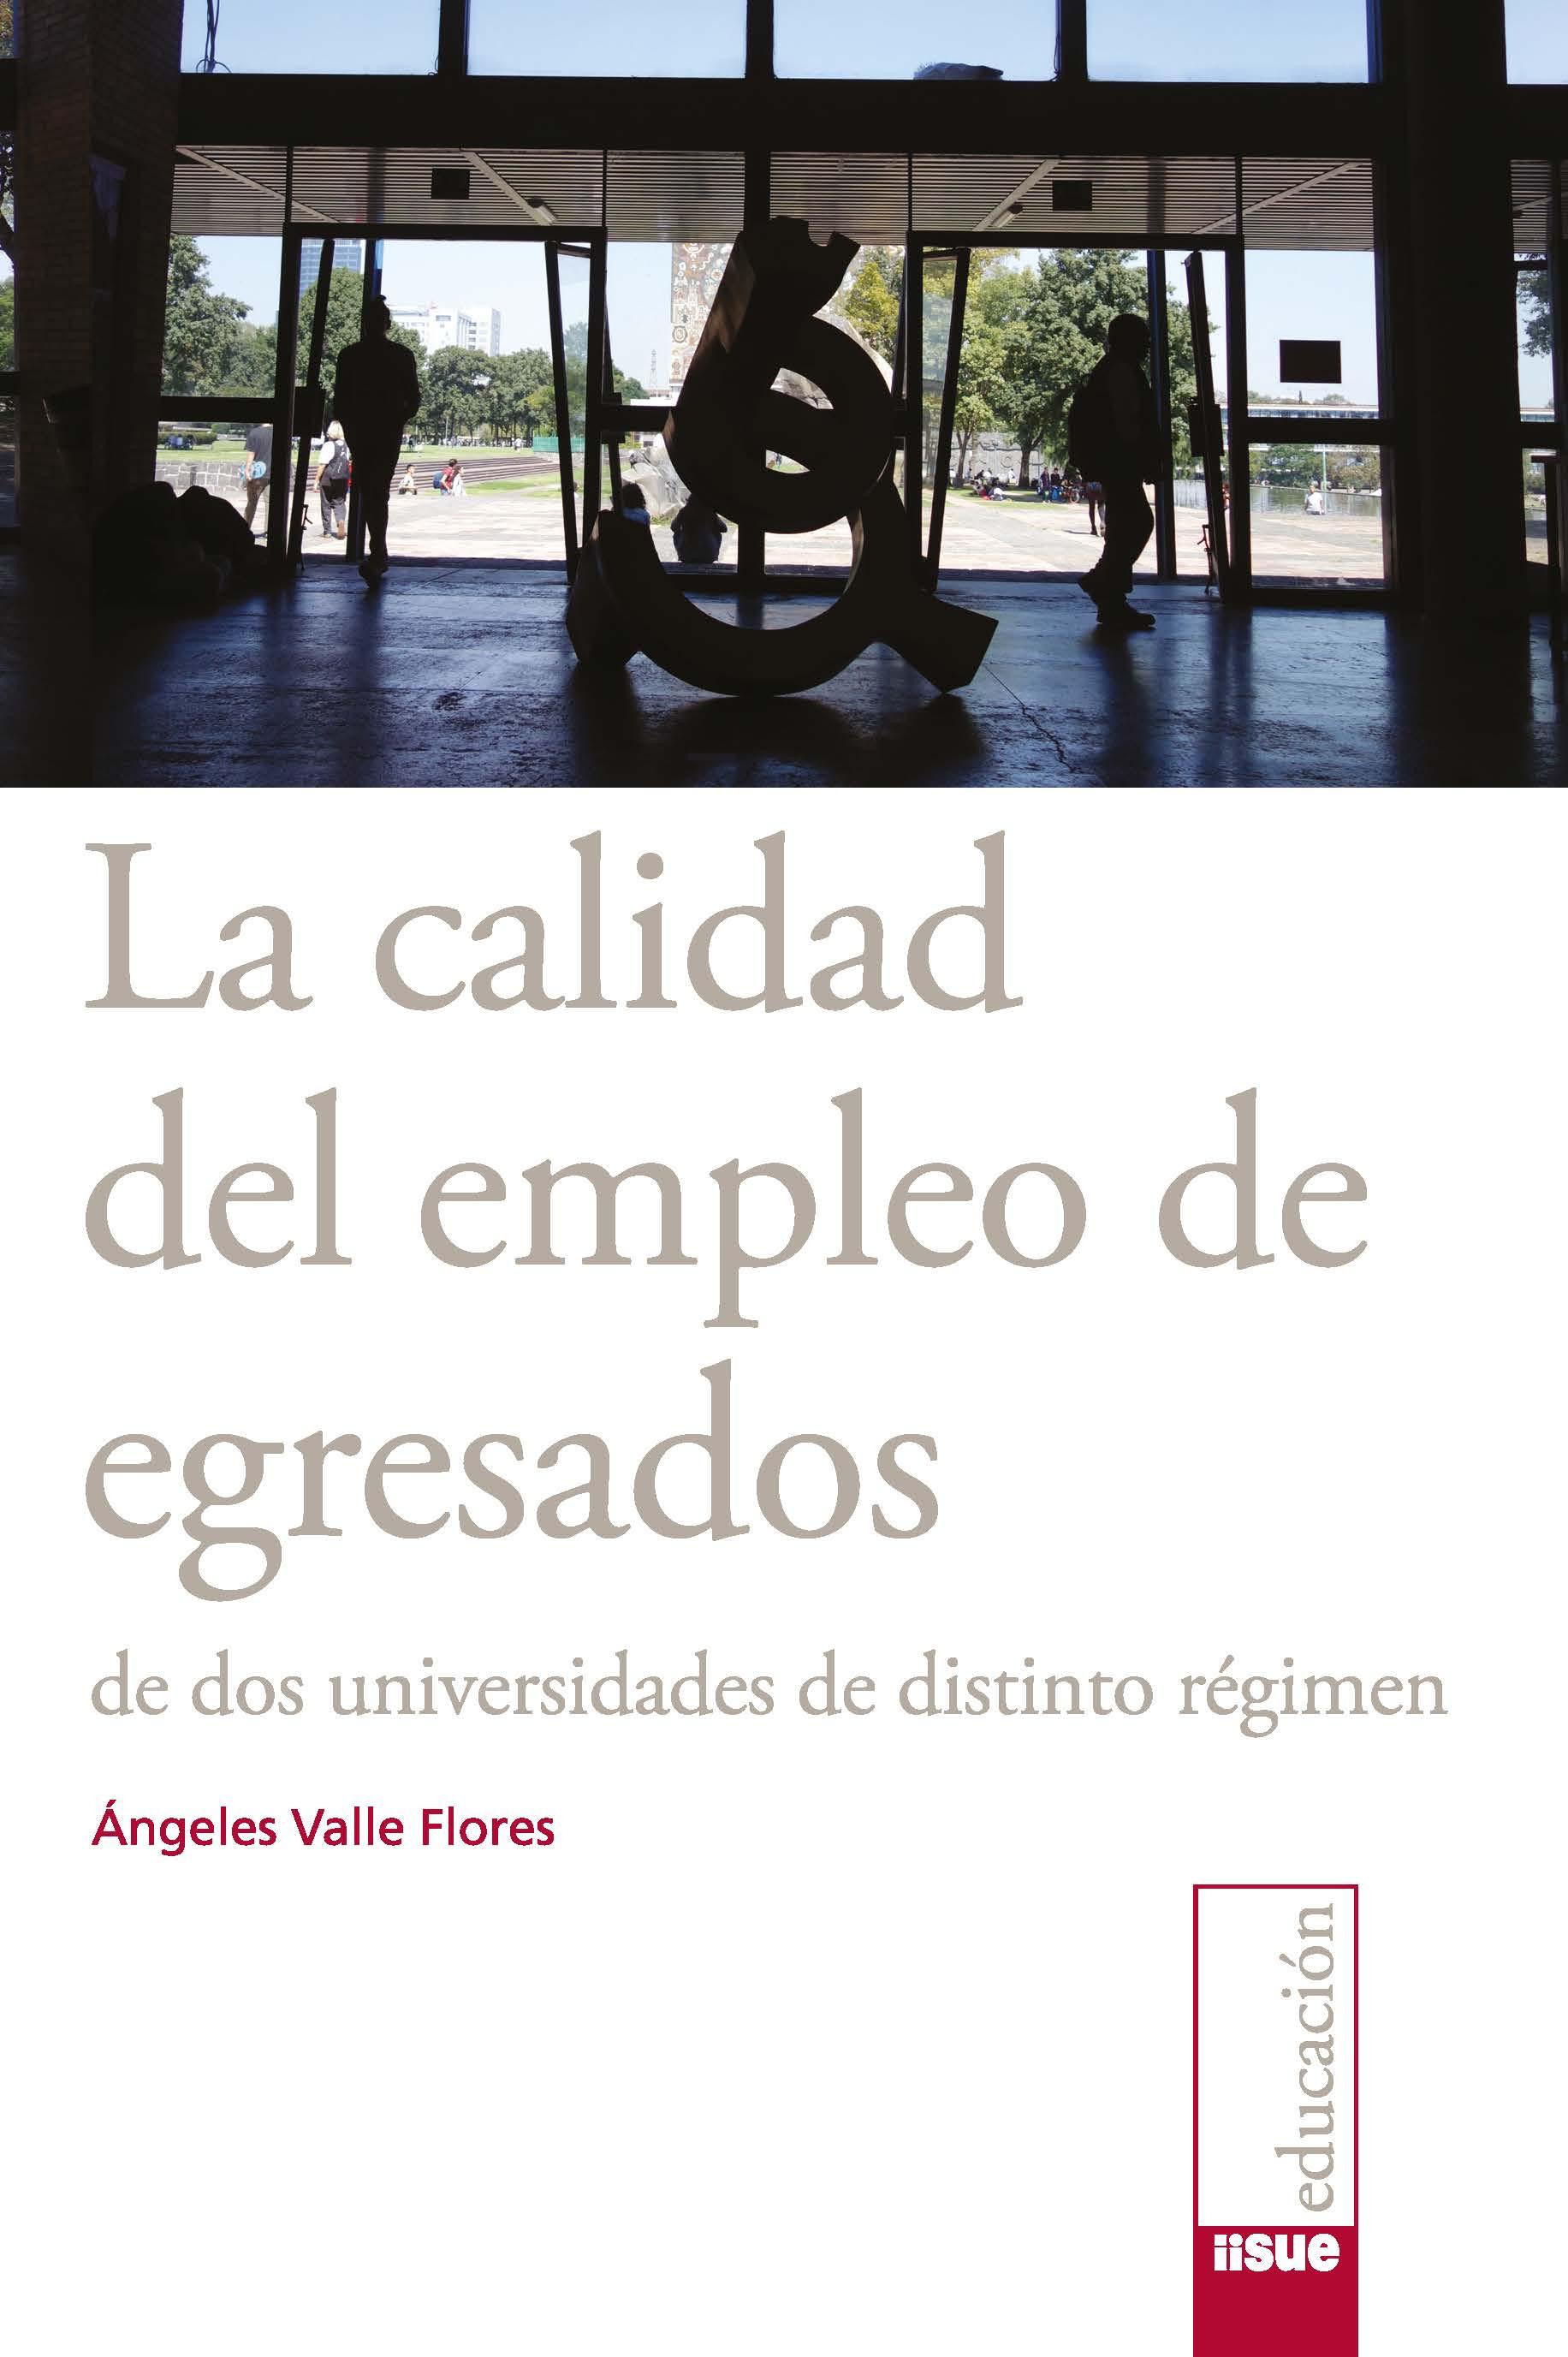 La calidad del empleo de egresados de dos universidades de distinto régimen